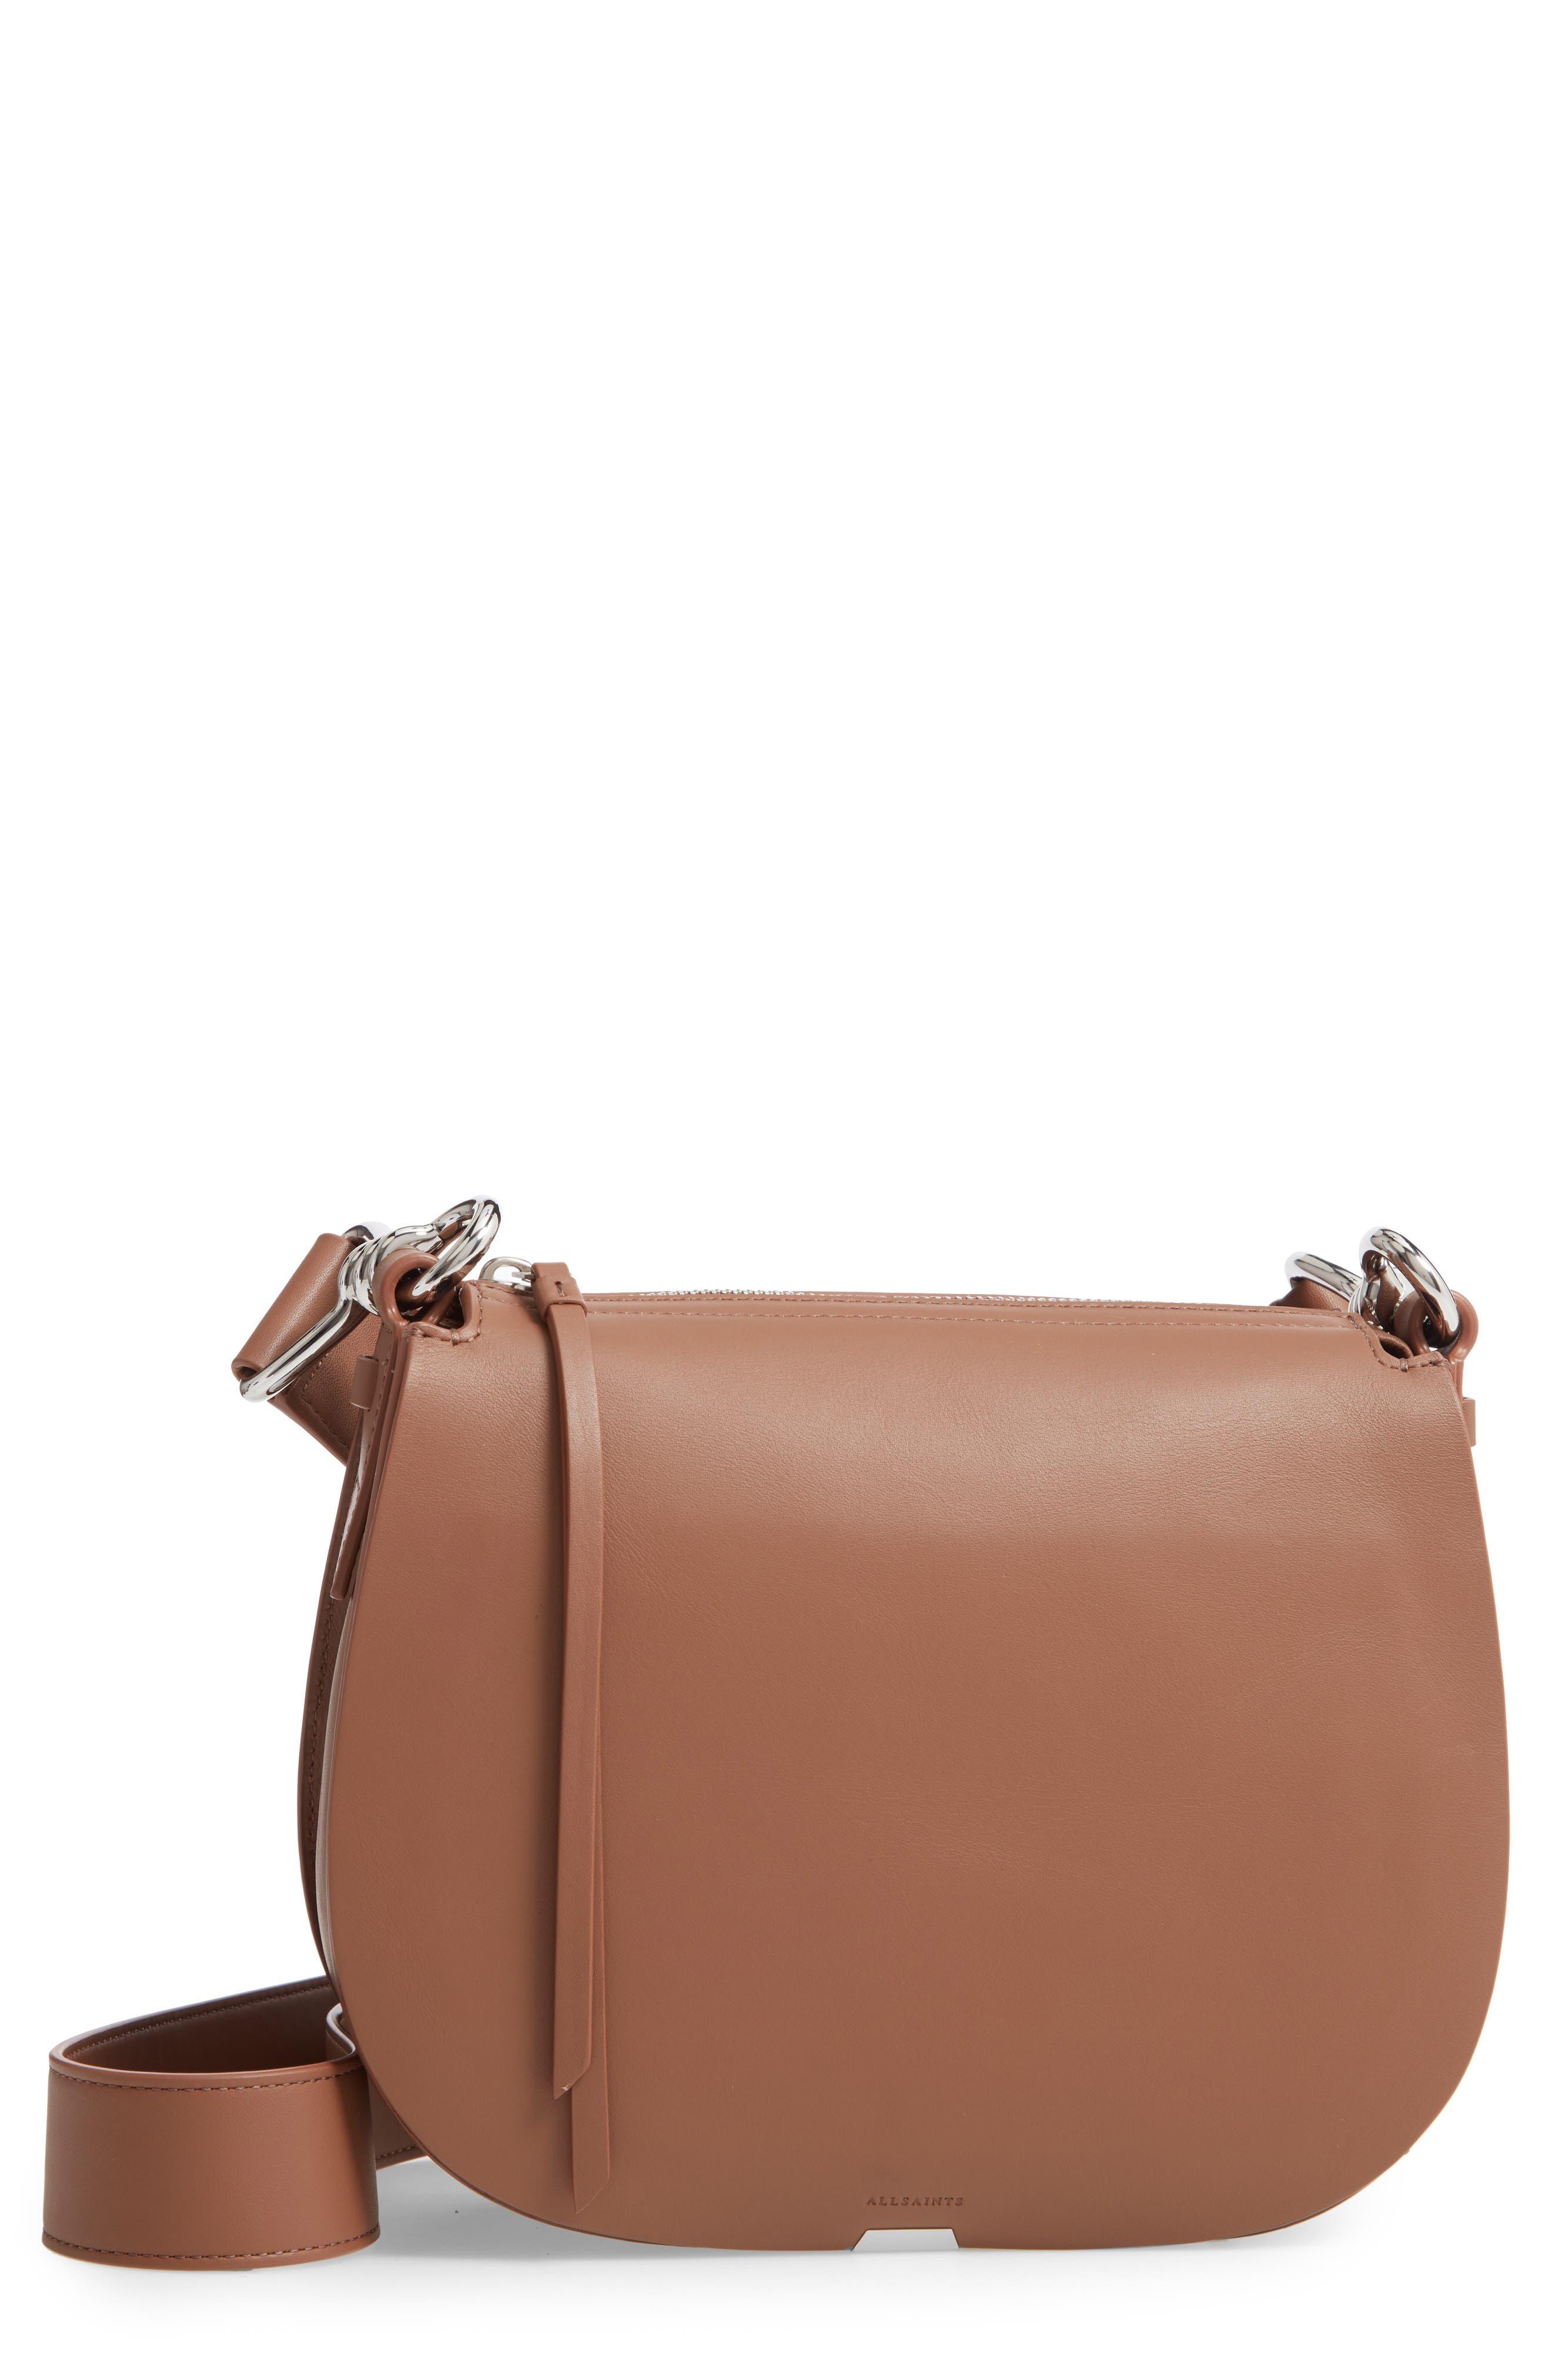 ALLSAINTS, Captain Round Leather Crossbody Bag, Main thumbnail 1, color, MILK CHOCOLATE